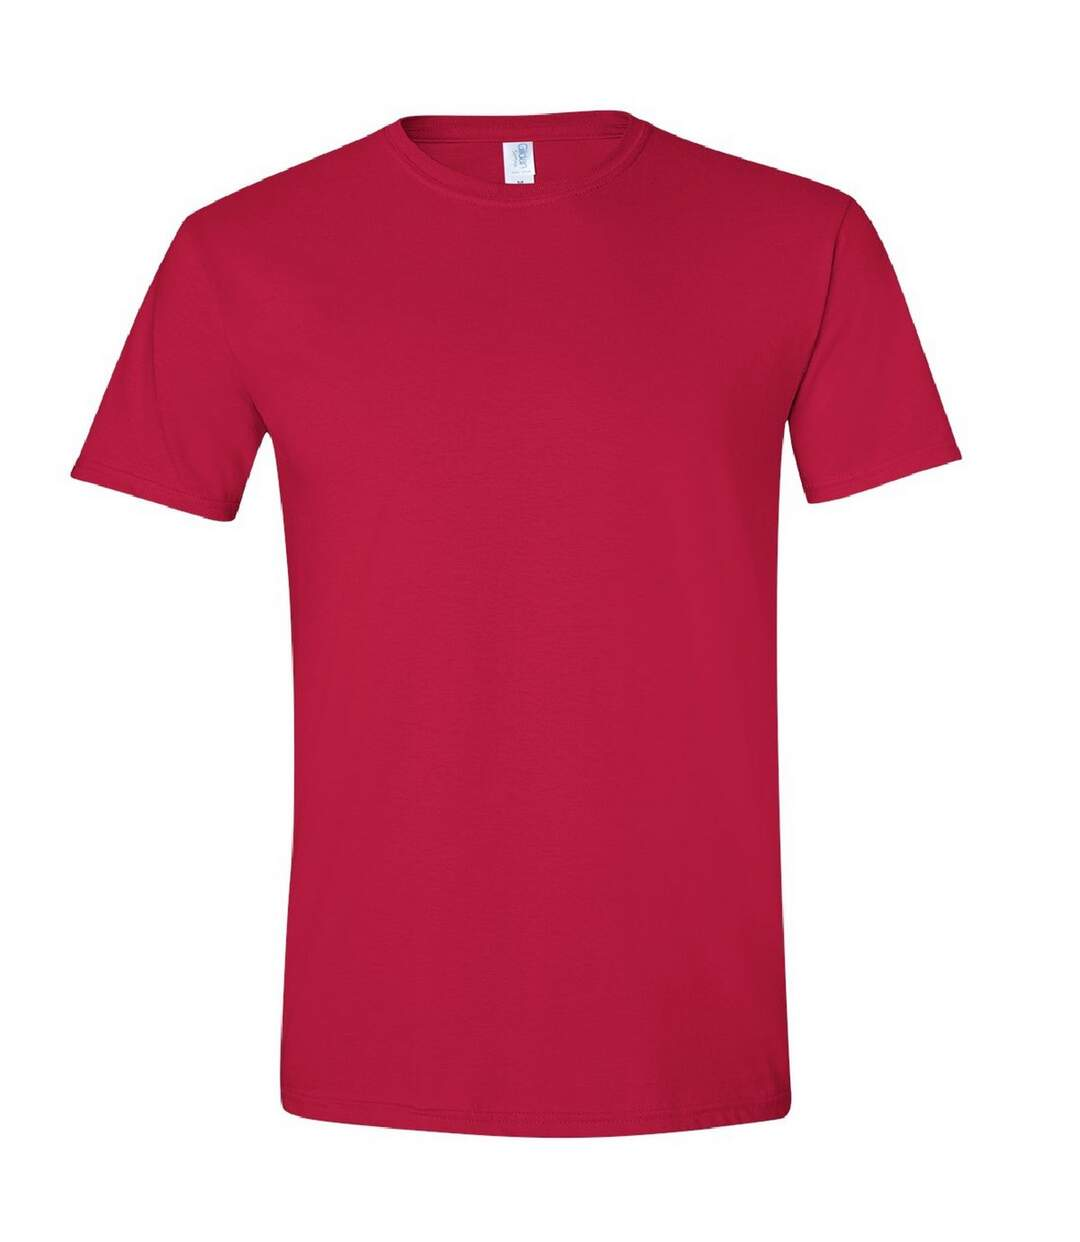 Gildan Mens Short Sleeve Soft-Style T-Shirt (Cherry Red) - UTBC484